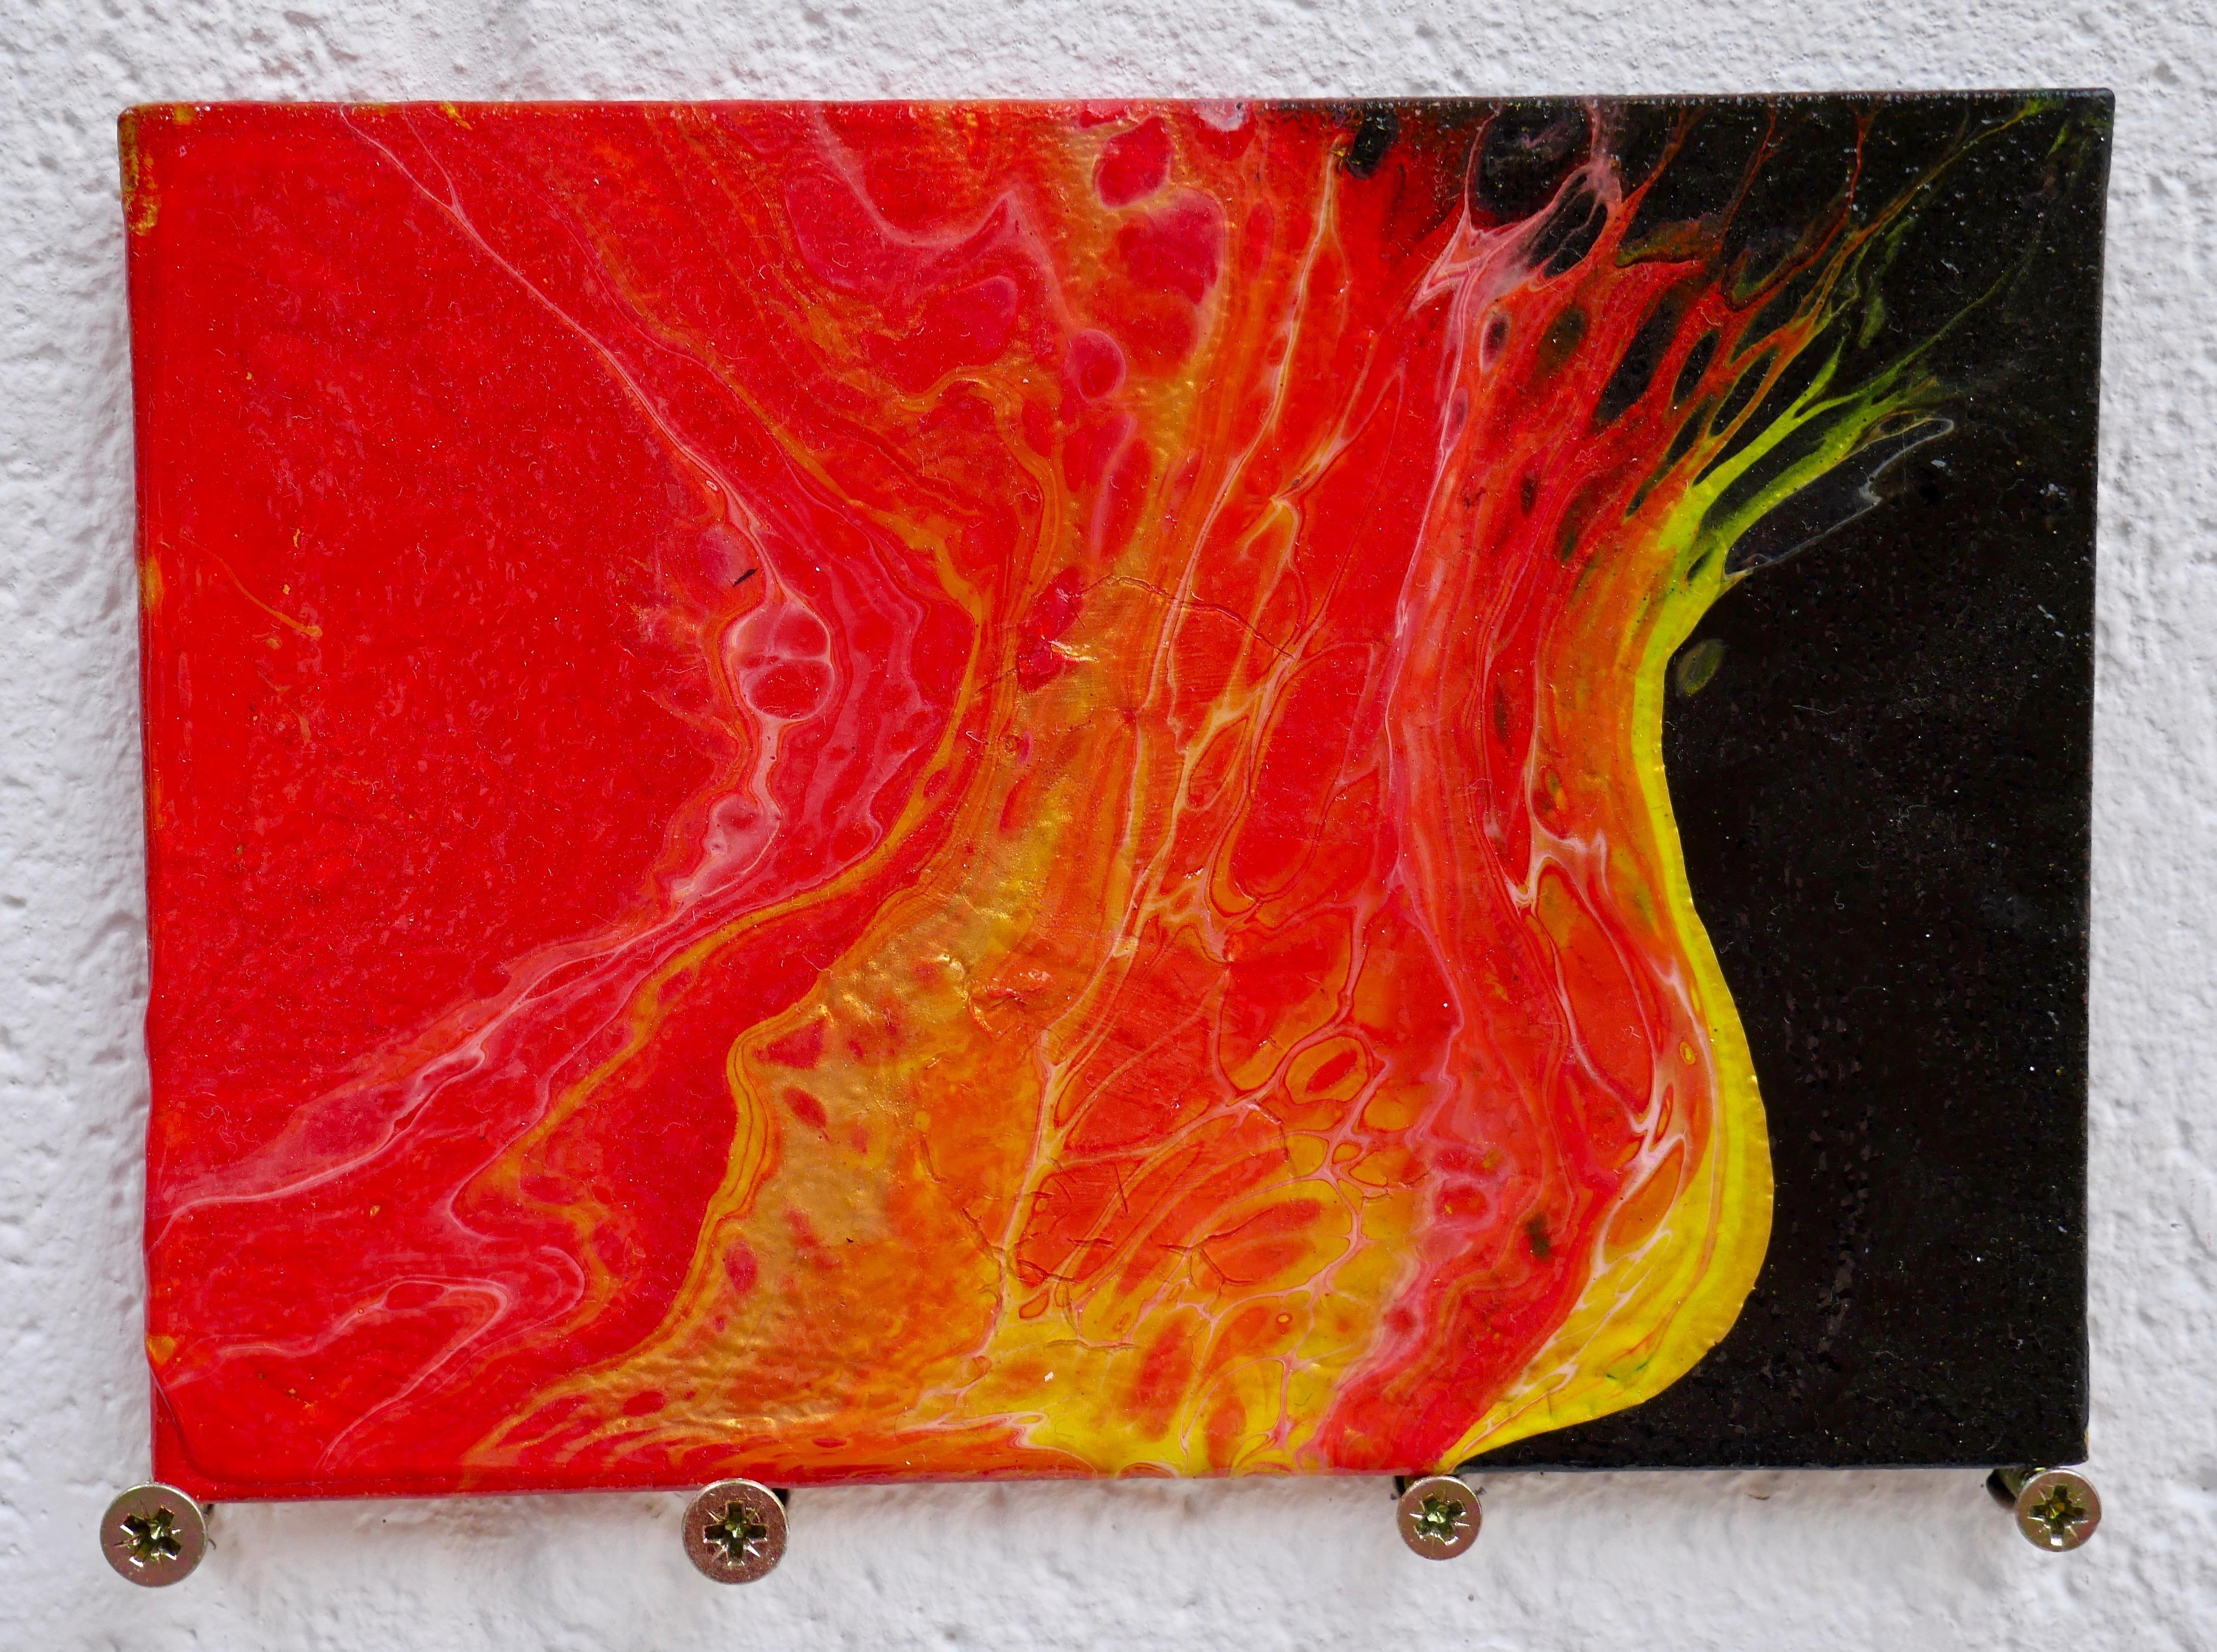 'Flame'